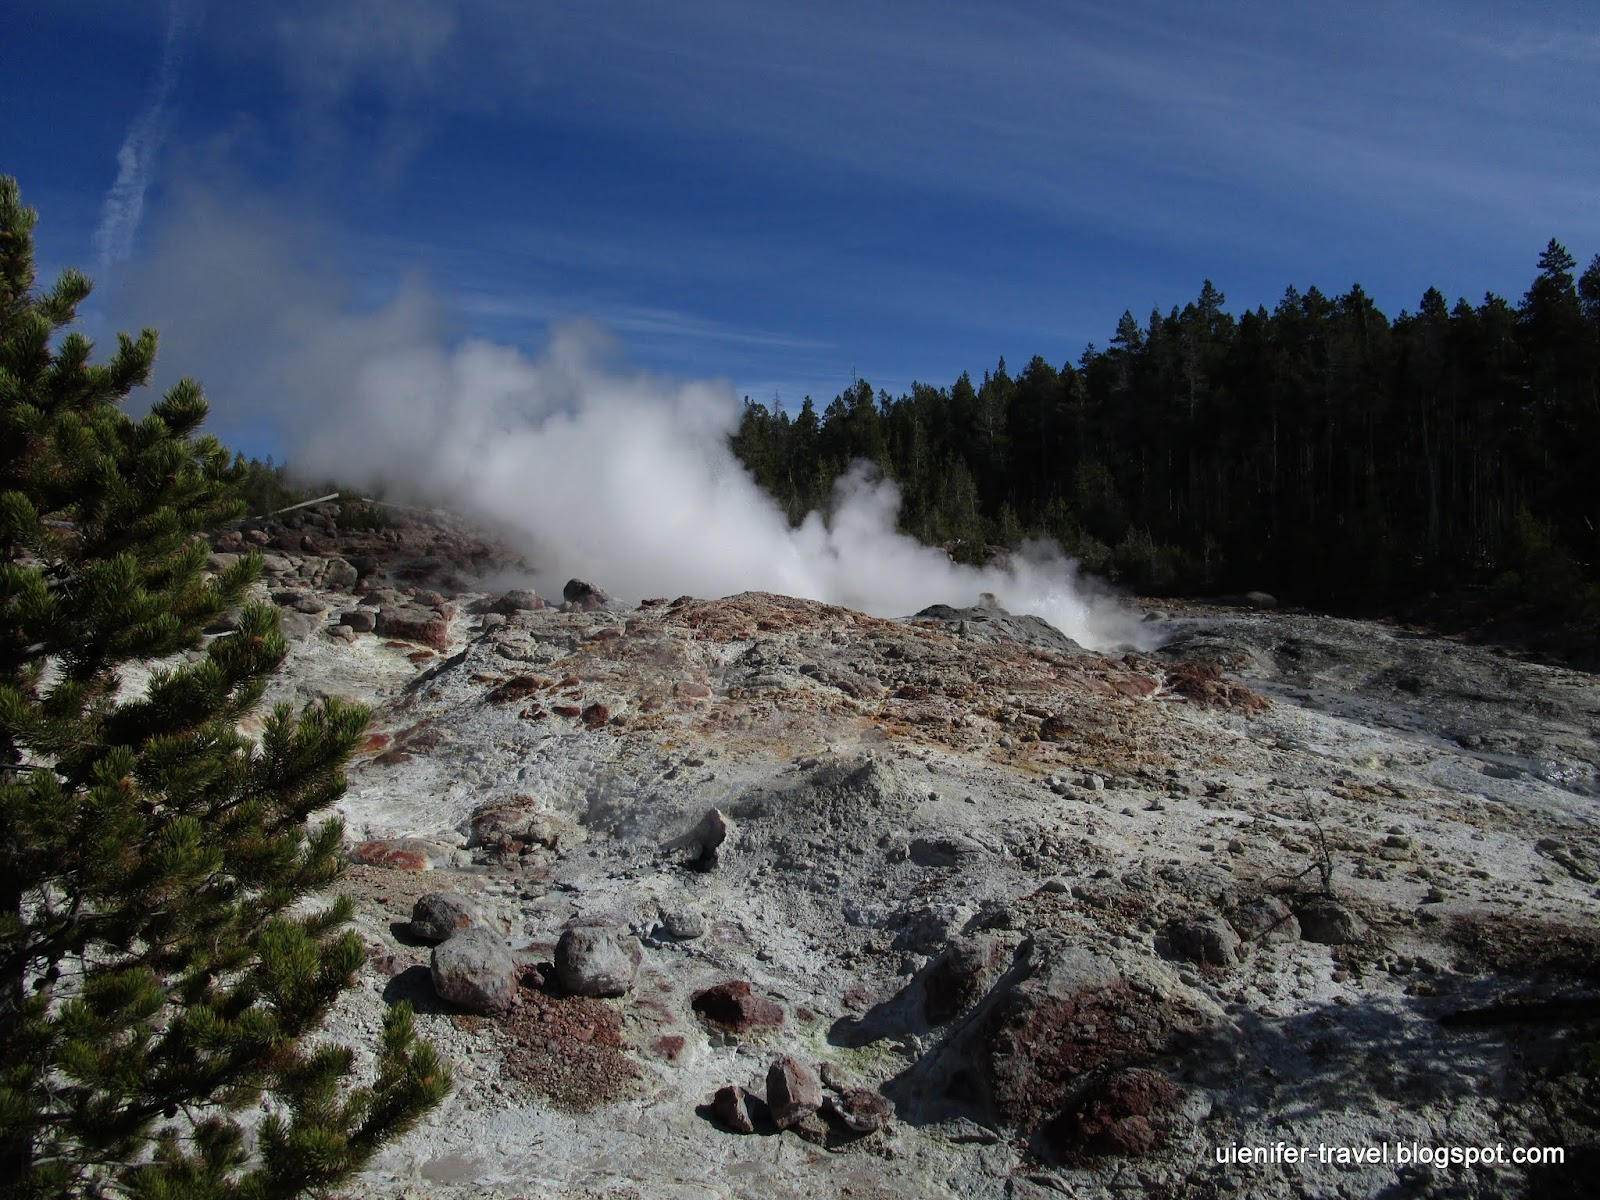 Самый высокий в мире действующий гейзер - Стимбоат Гейзер. Йеллоустоун, Вайоминг (Steamboat Geyser. Norris Geyser Basin. Yellowstone National Park, WY)